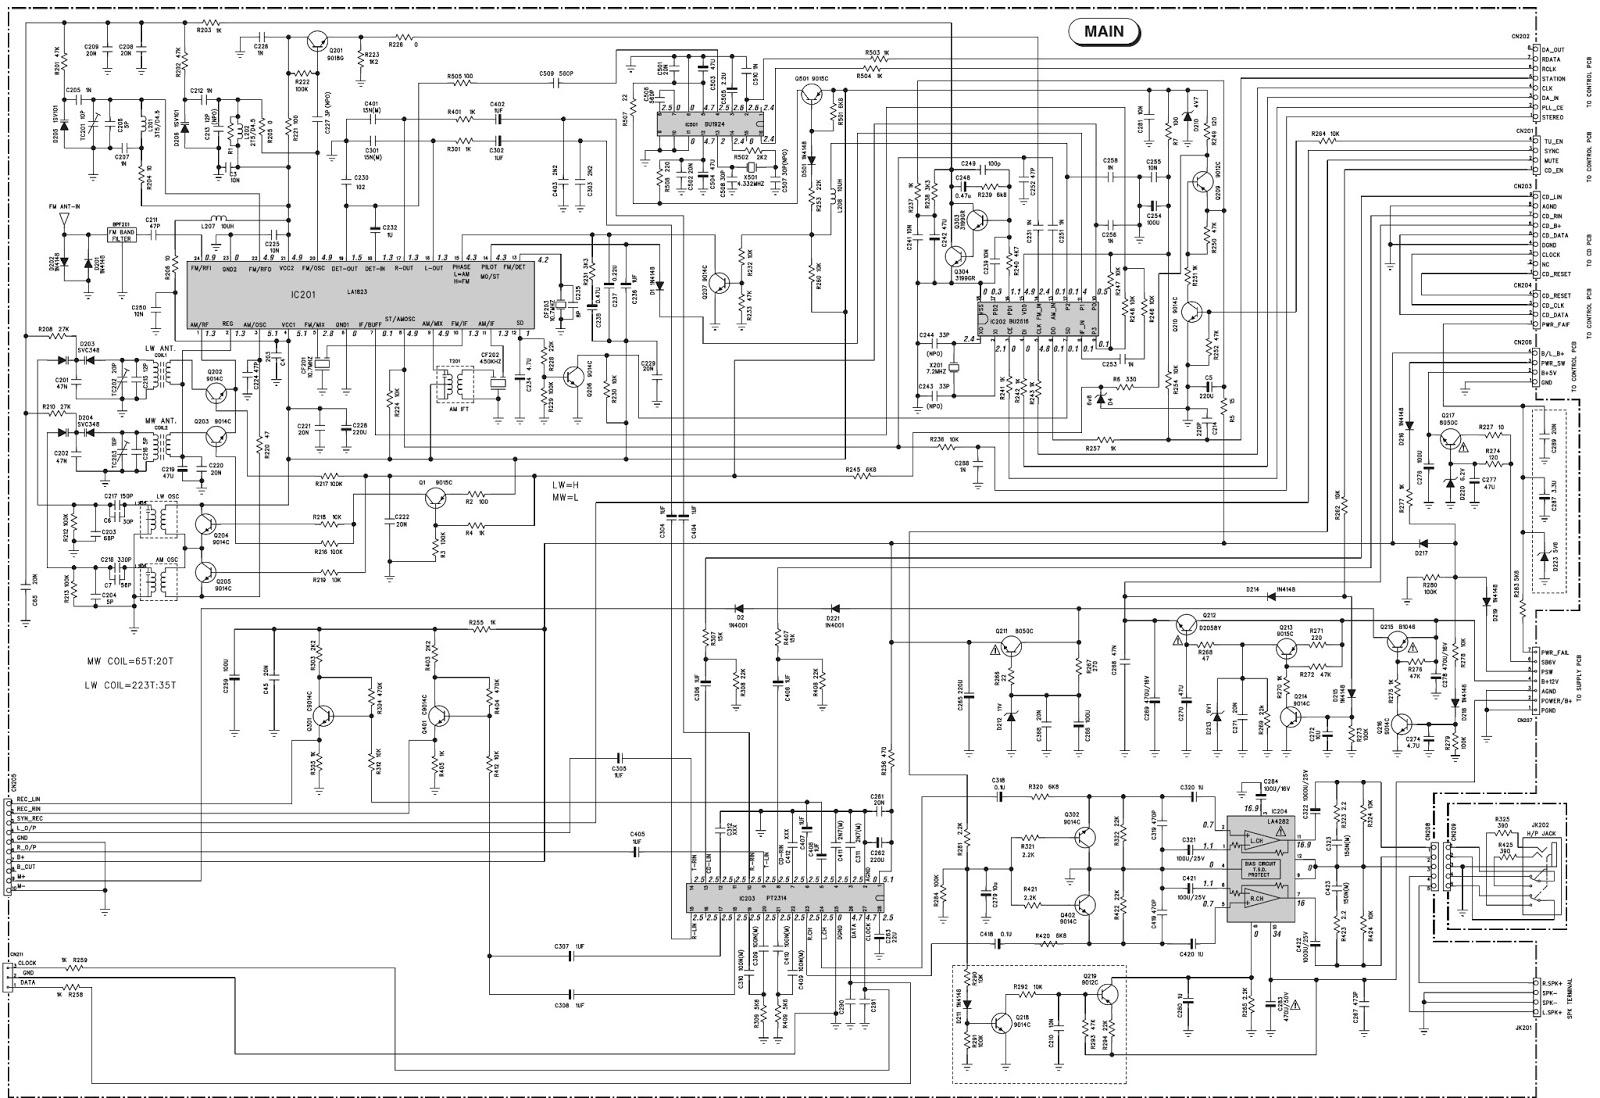 medium resolution of yamaha schematic diagram 24 wiring diagram images yamaha g5 amp schematic yamaha g5 amp schematic